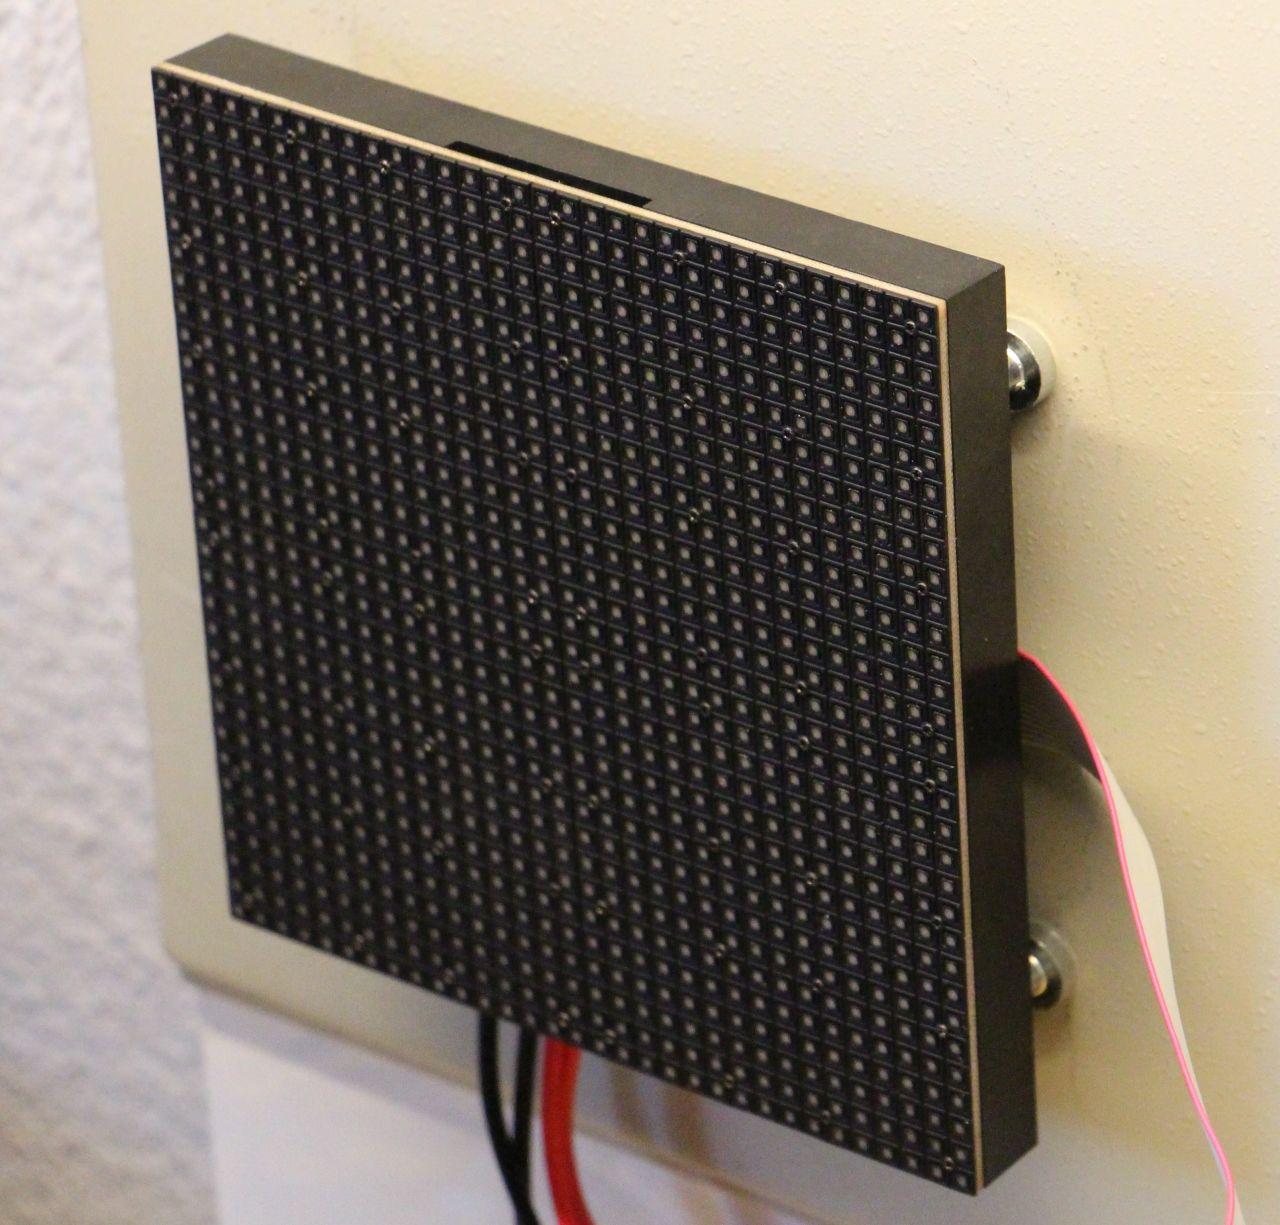 Adafruit 32x32 RGB LED Matrix Panel